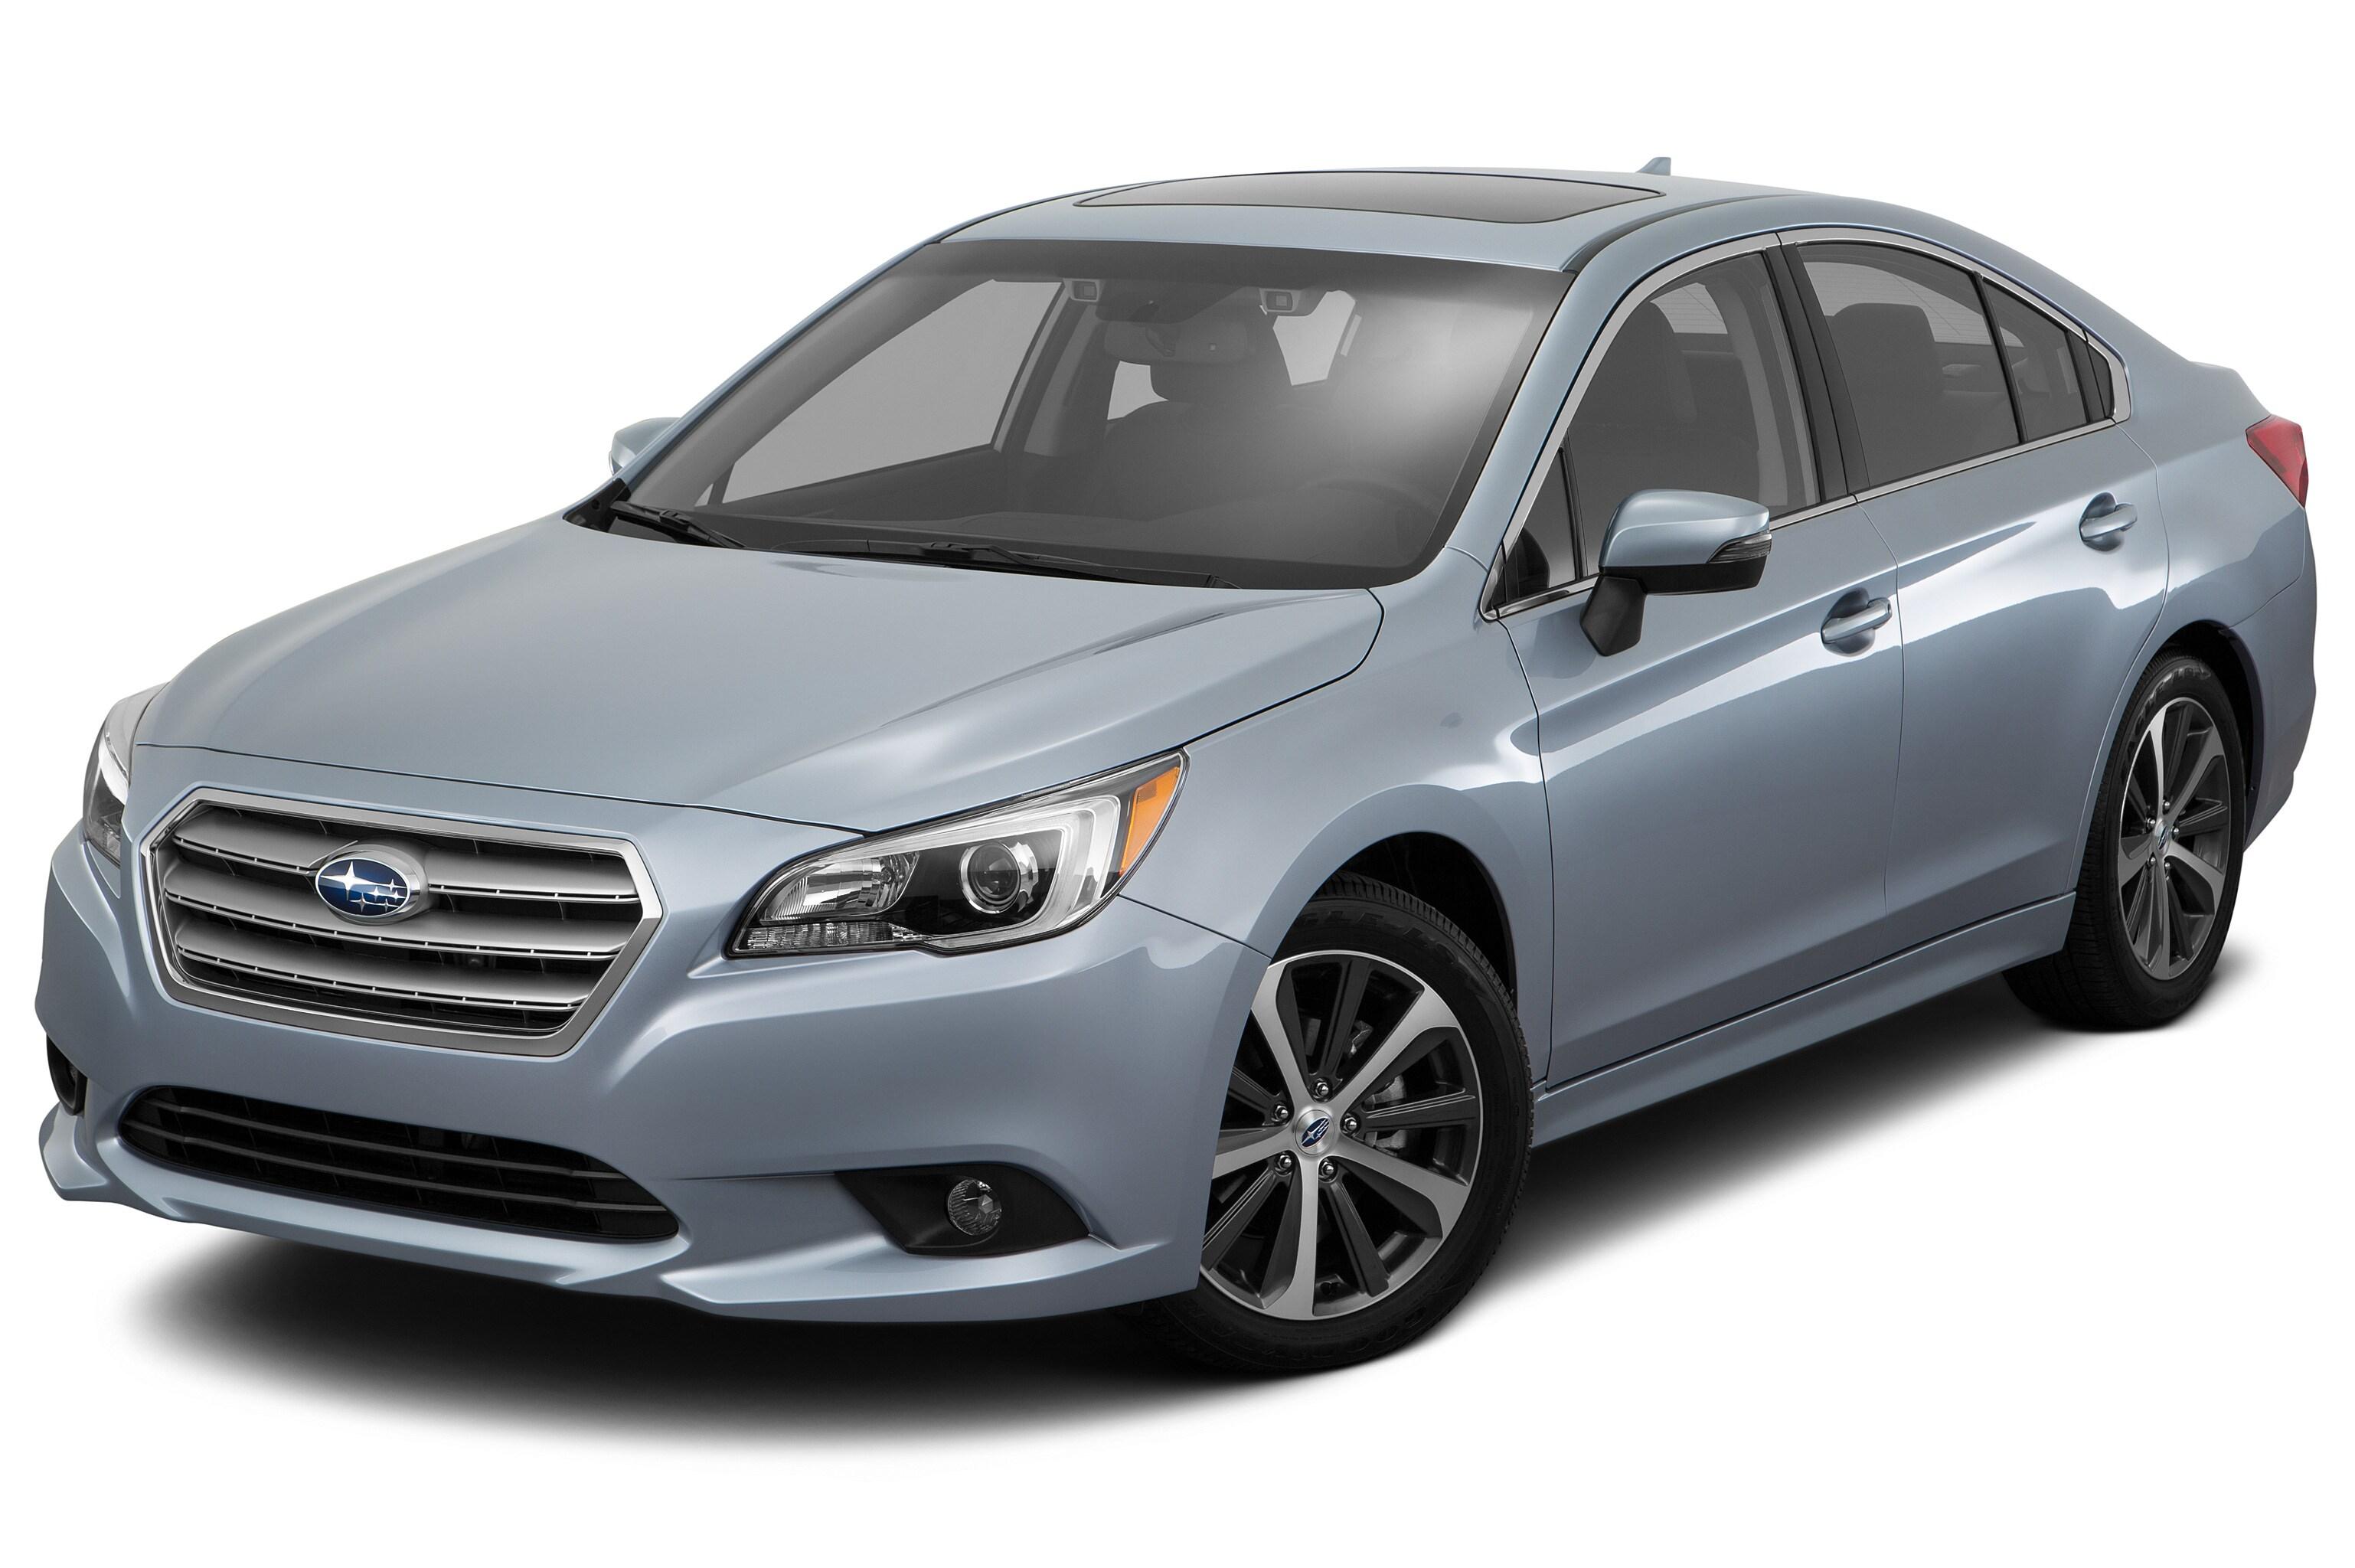 Mark Miller Subaru Southtowne >> Mark Miller Subaru South Towne | New Subaru dealership in Sandy, UT 84070